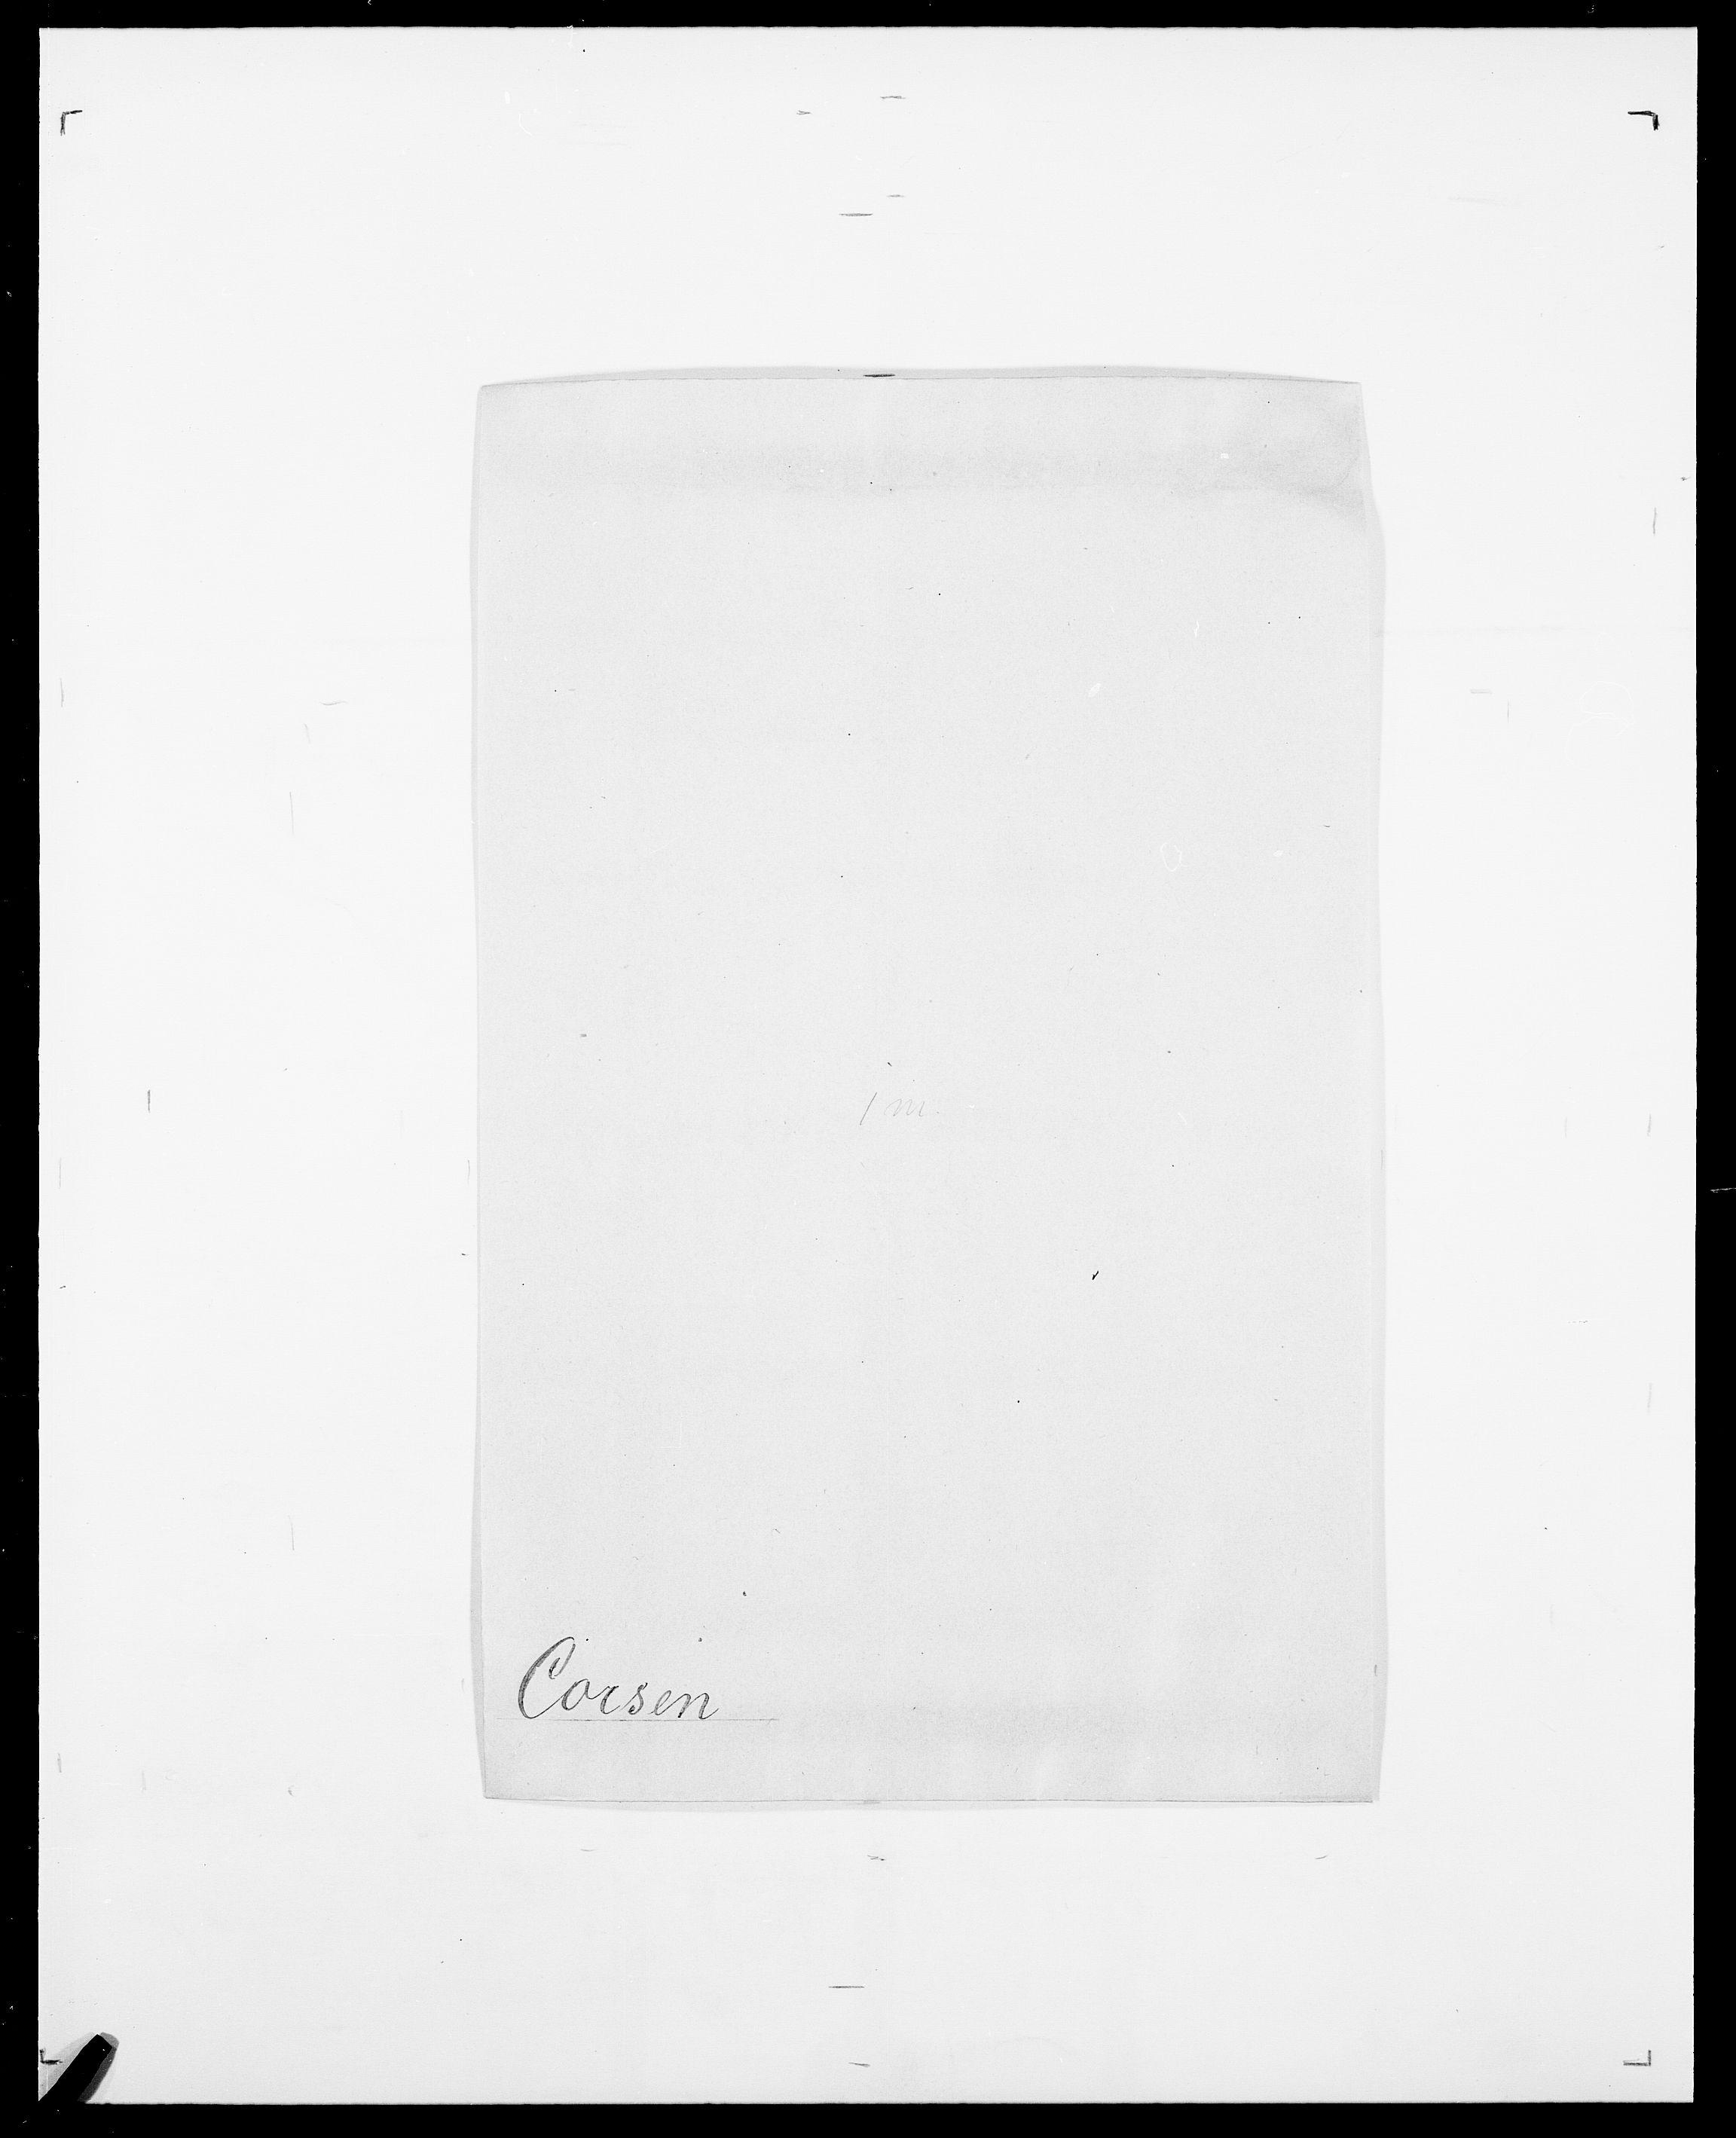 SAO, Delgobe, Charles Antoine - samling, D/Da/L0008: Capjon - Dagenbolt, s. 543